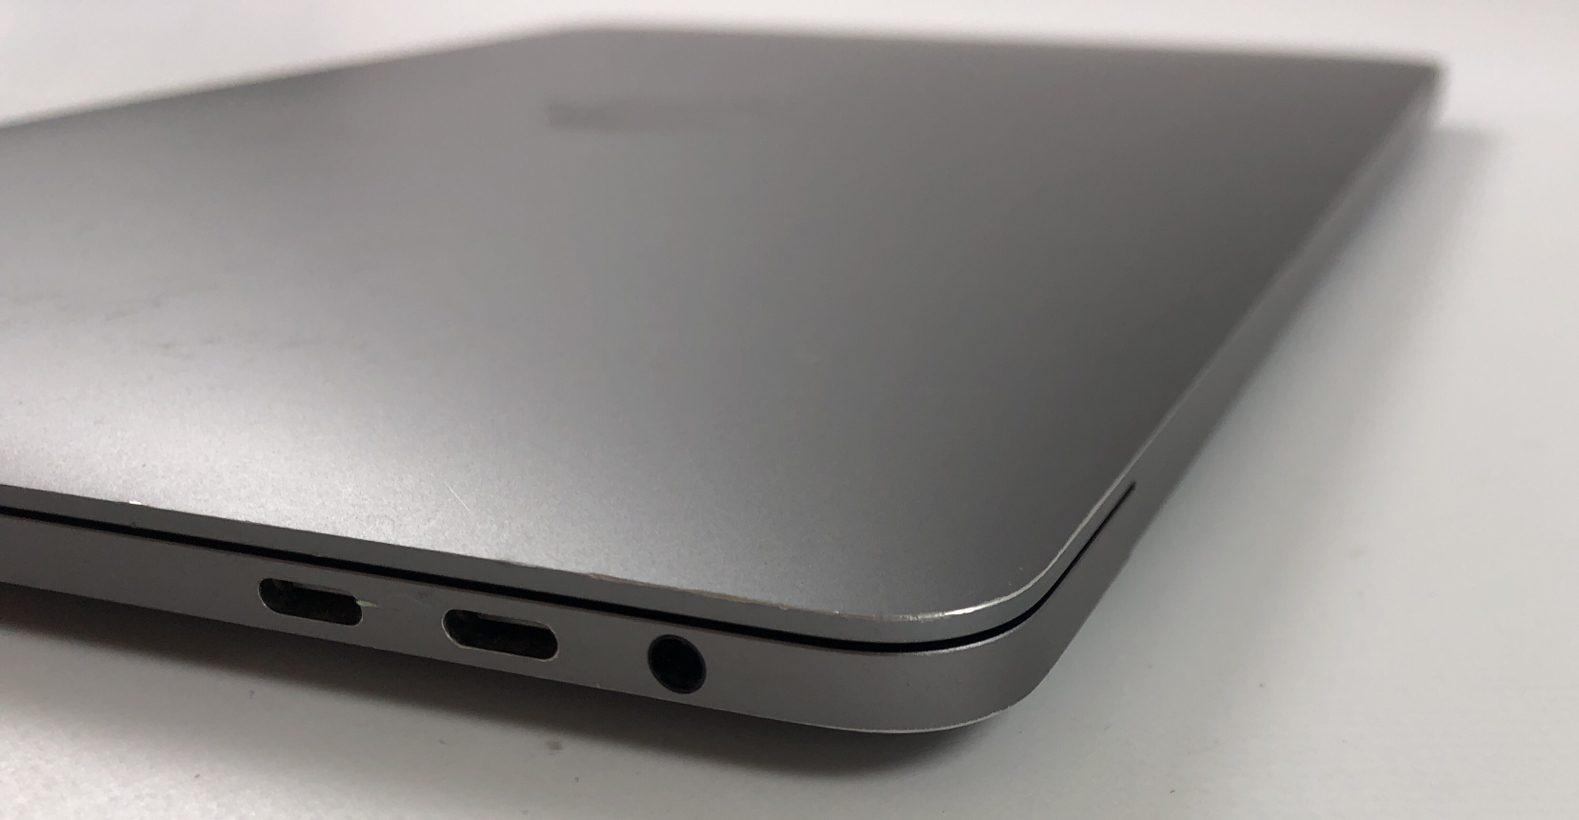 "MacBook Pro 13"" 4TBT Late 2016 (Intel Core i5 2.9 GHz 8 GB RAM 256 GB SSD), Space Gray, Intel Core i5 2.9 GHz, 8 GB RAM, 256 GB SSD, Kuva 4"